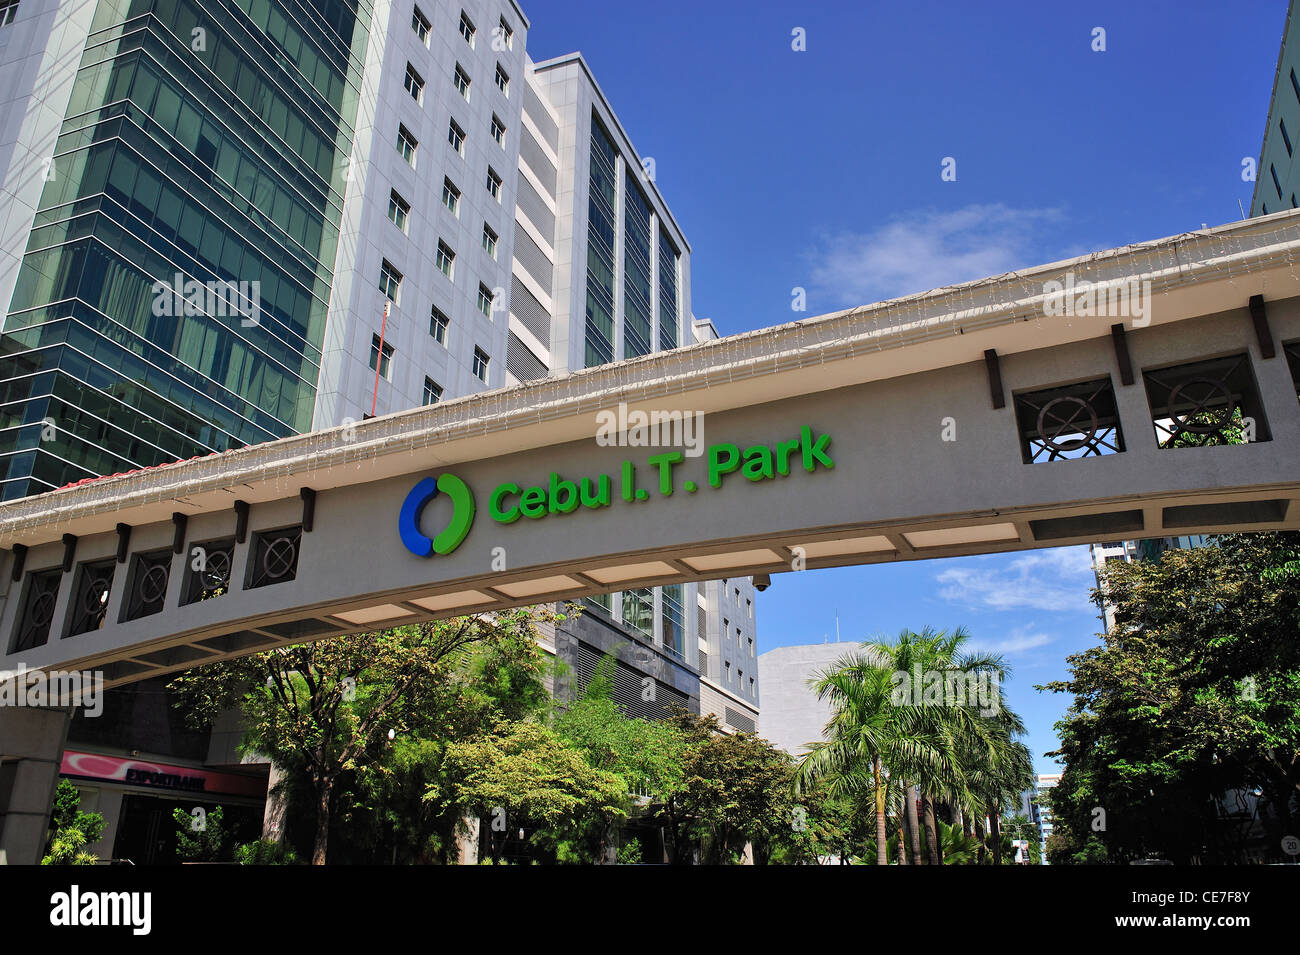 Cebu I.T. Park Cebu City Philippines - Stock Image